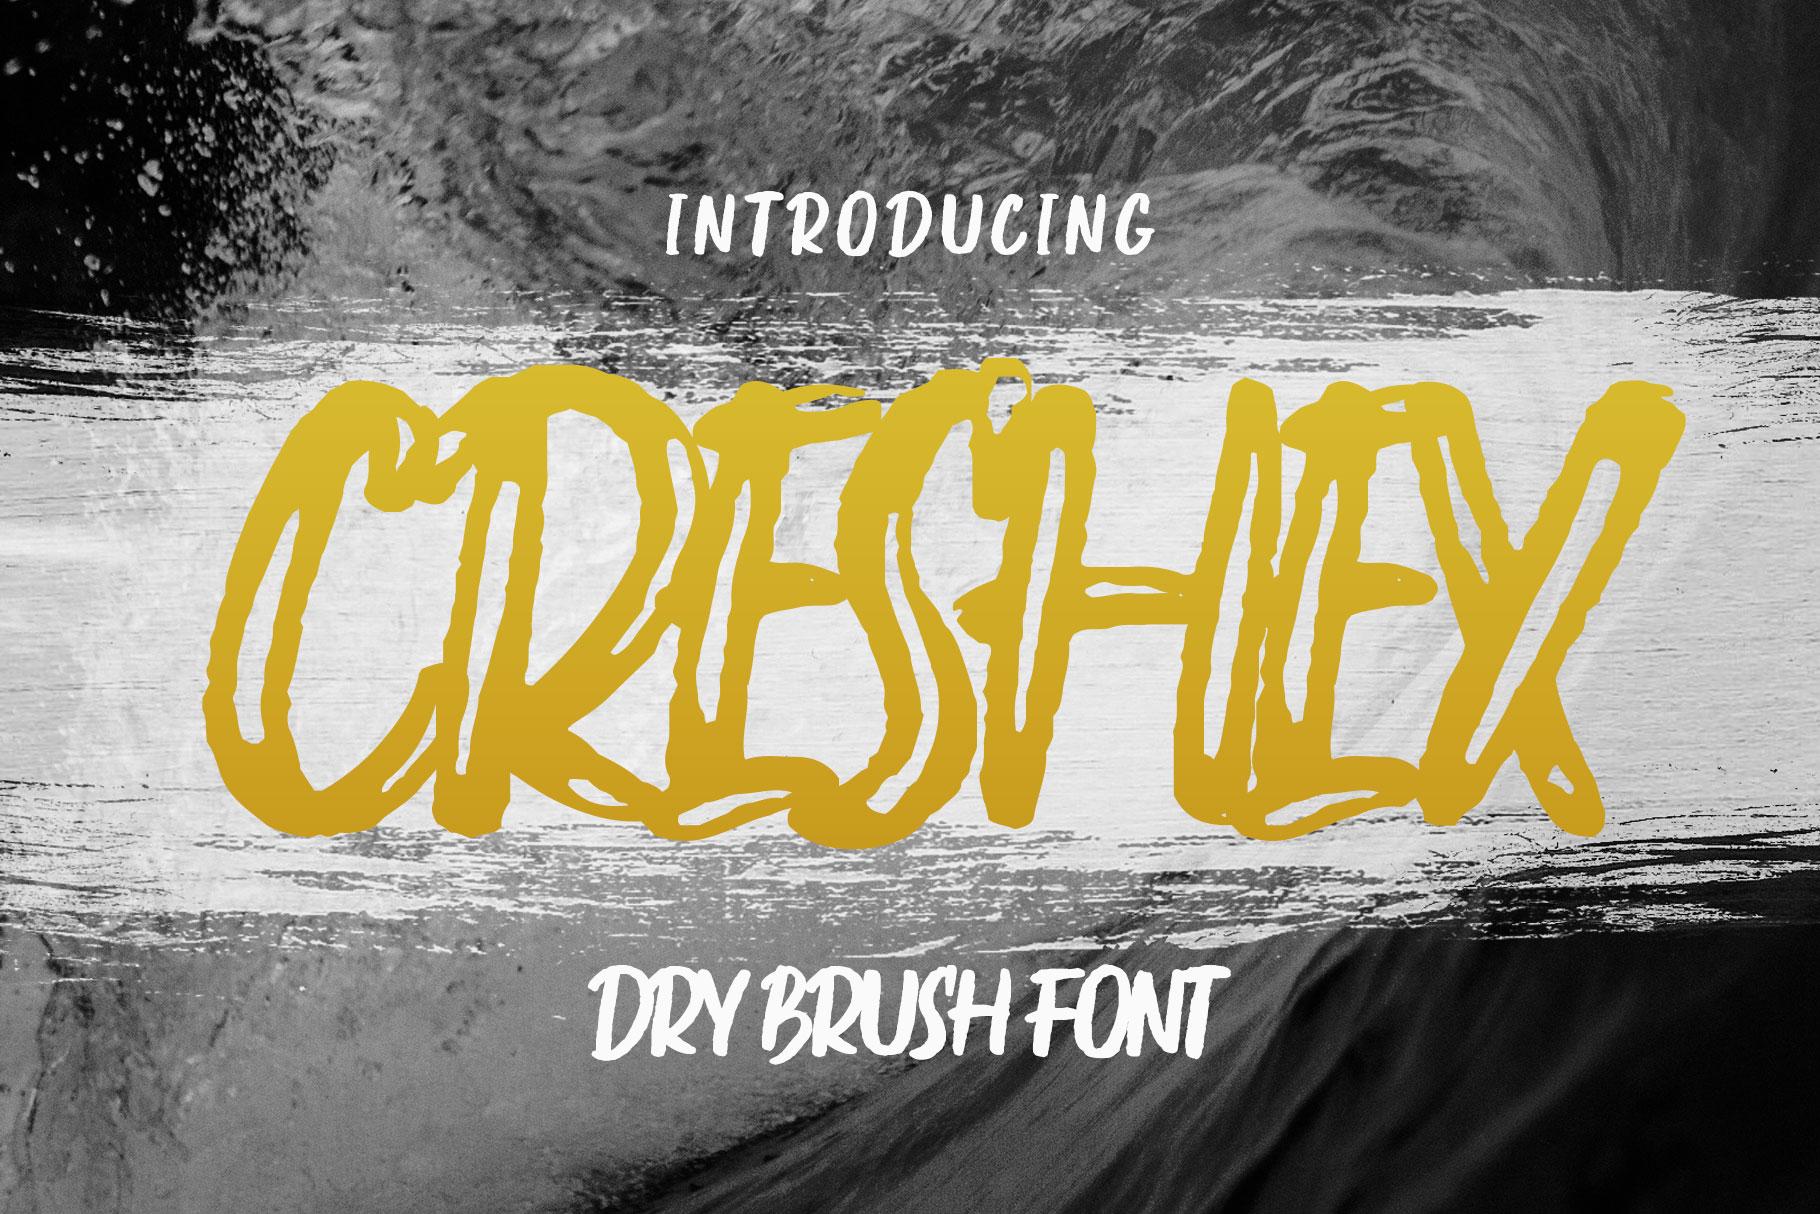 Creshex Dry Brush Font example image 1